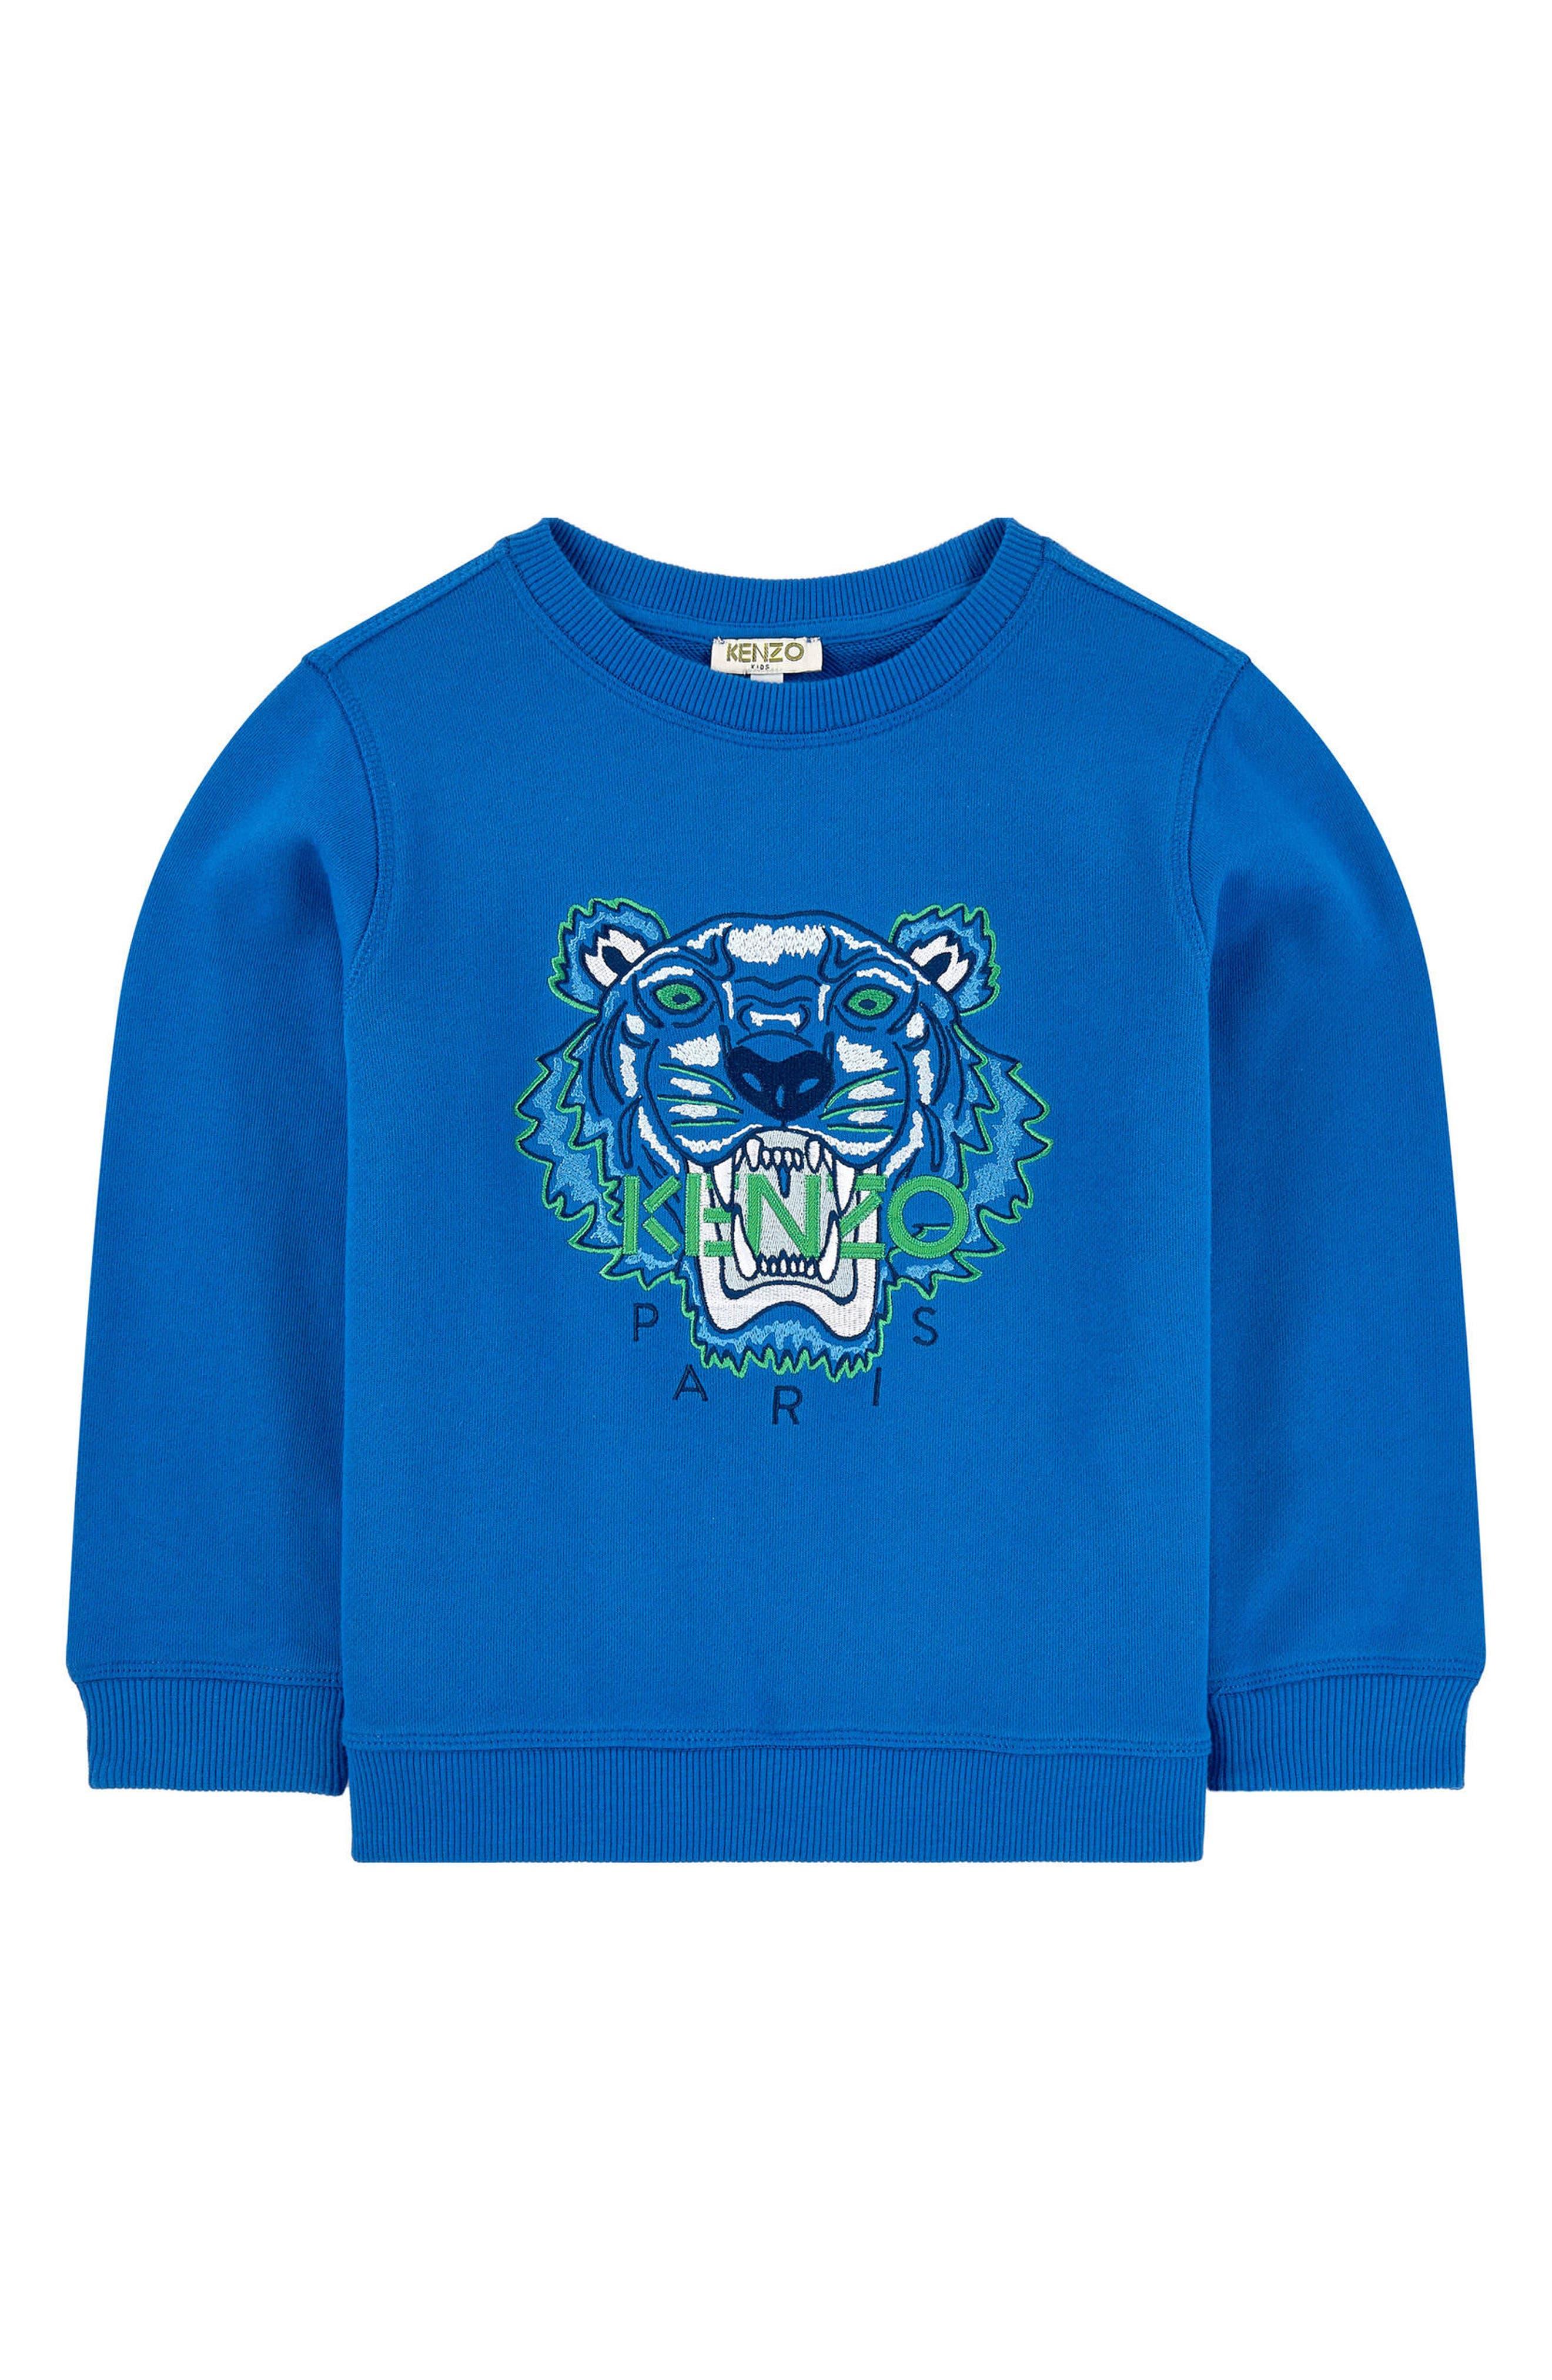 KENZO,                             Embroidered Tiger Logo Sweatshirt,                             Main thumbnail 1, color,                             ROYAL BLUE